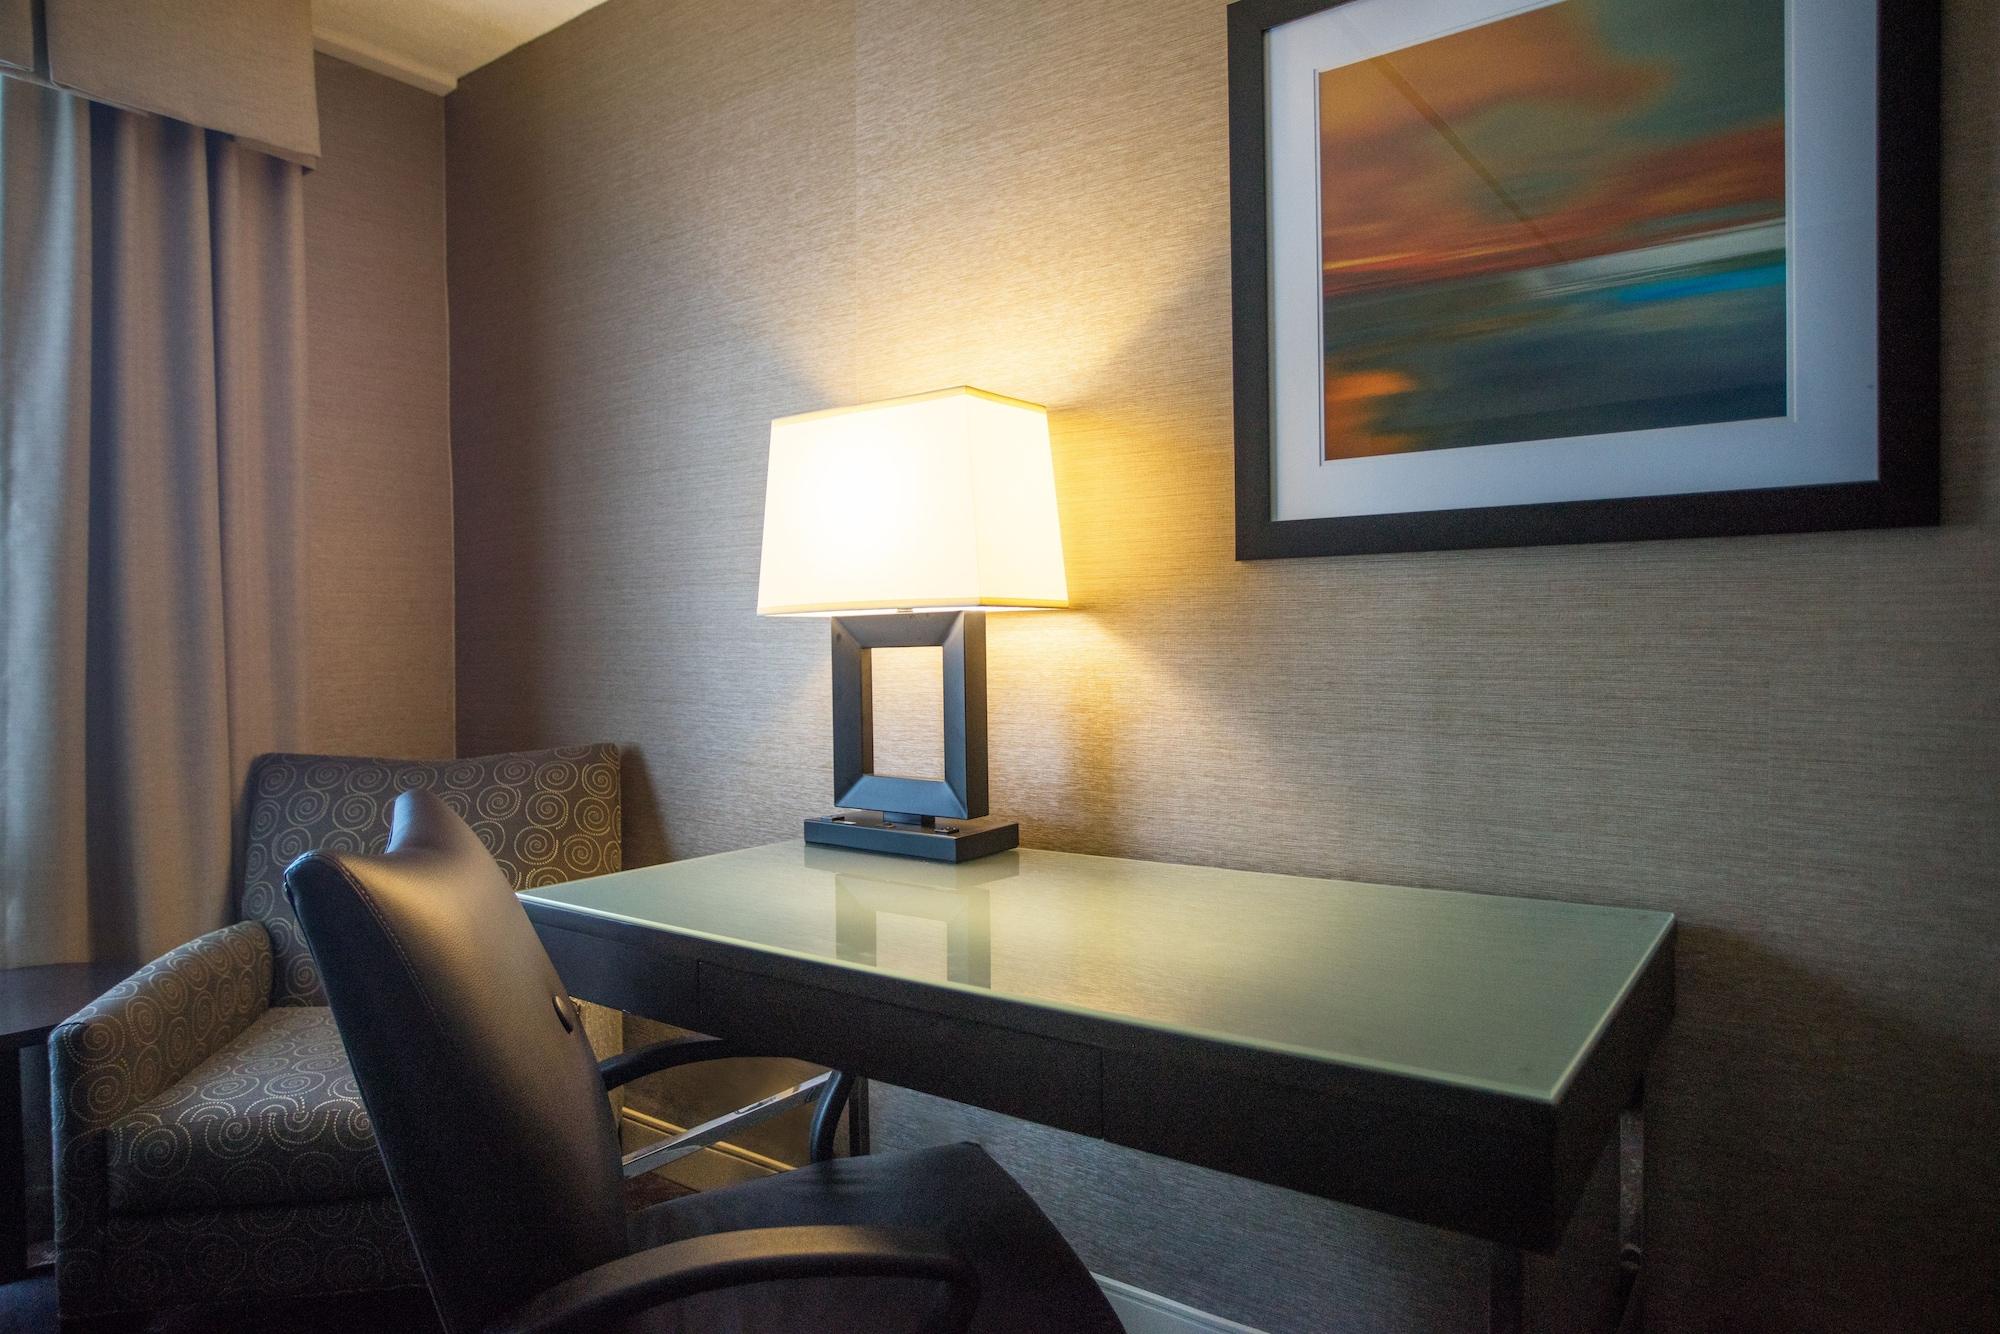 Holiday Inn South Kingstown (Newport Area), Washington